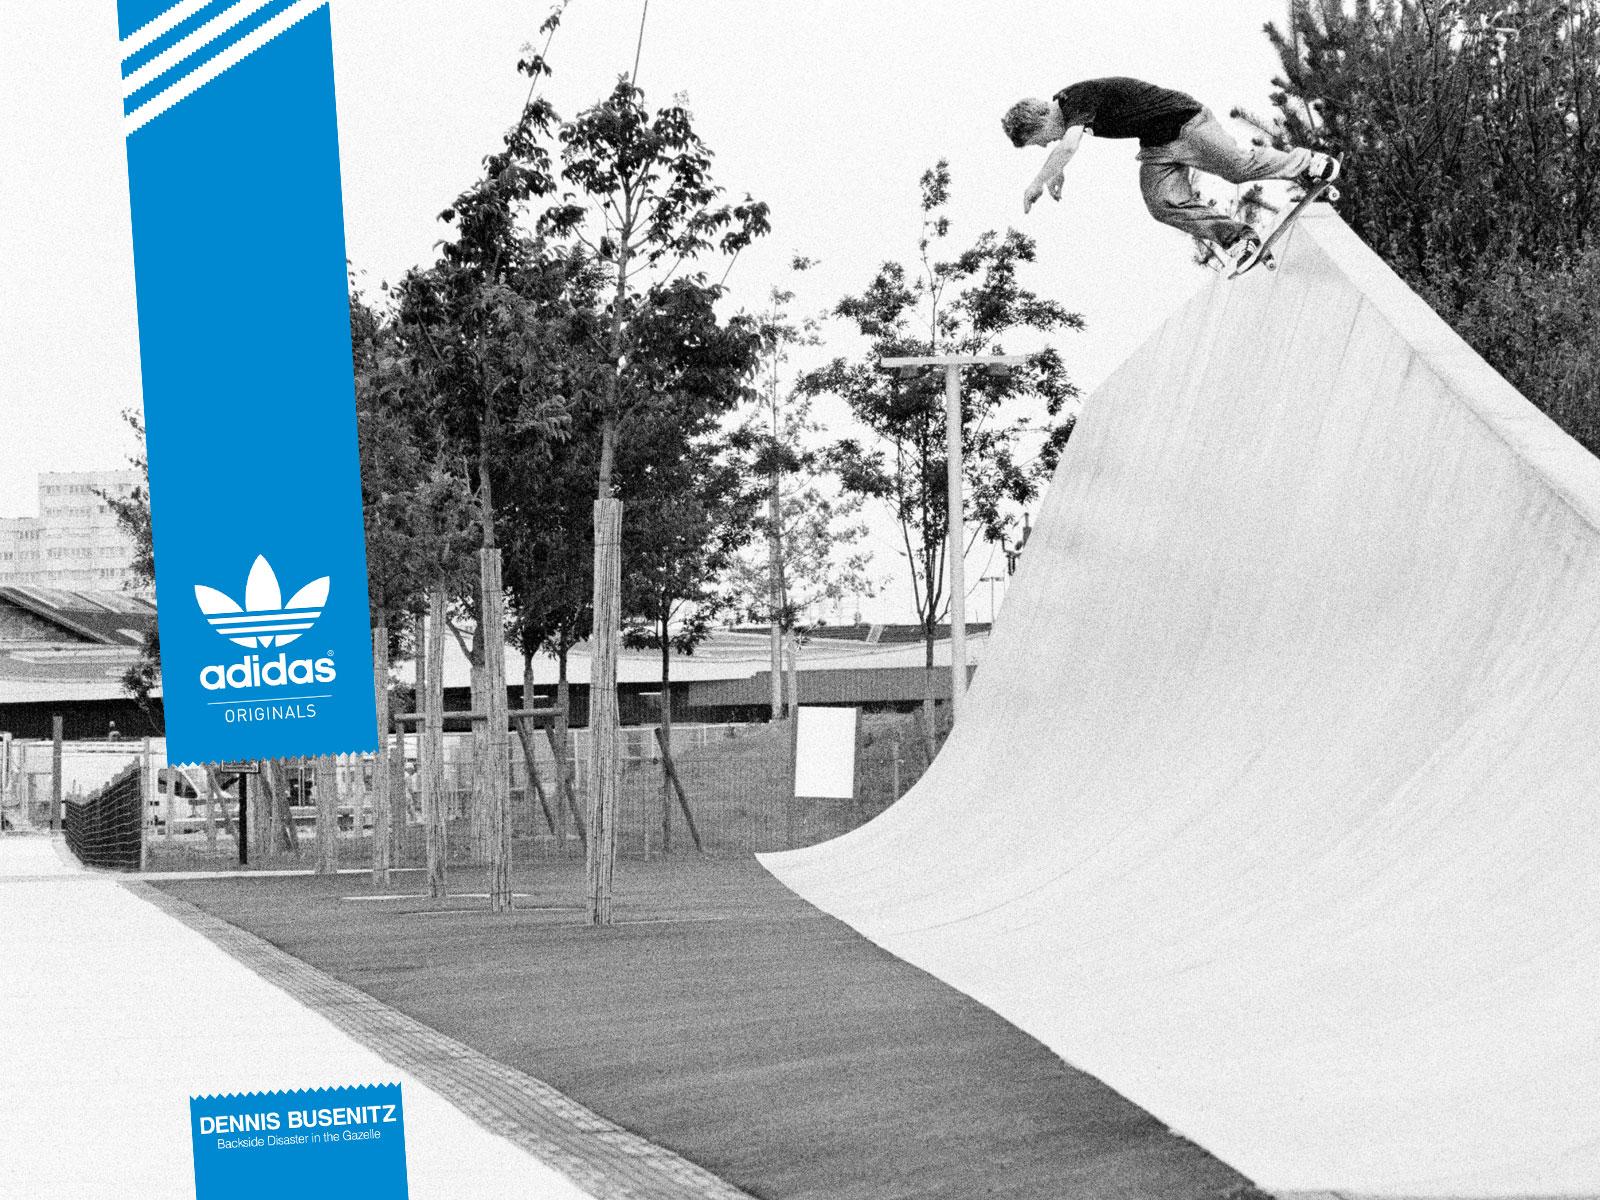 Girl Skateboards Wallpaper Hd Adidas Skateboarding Wallpapers Skateboarding Wallpapers